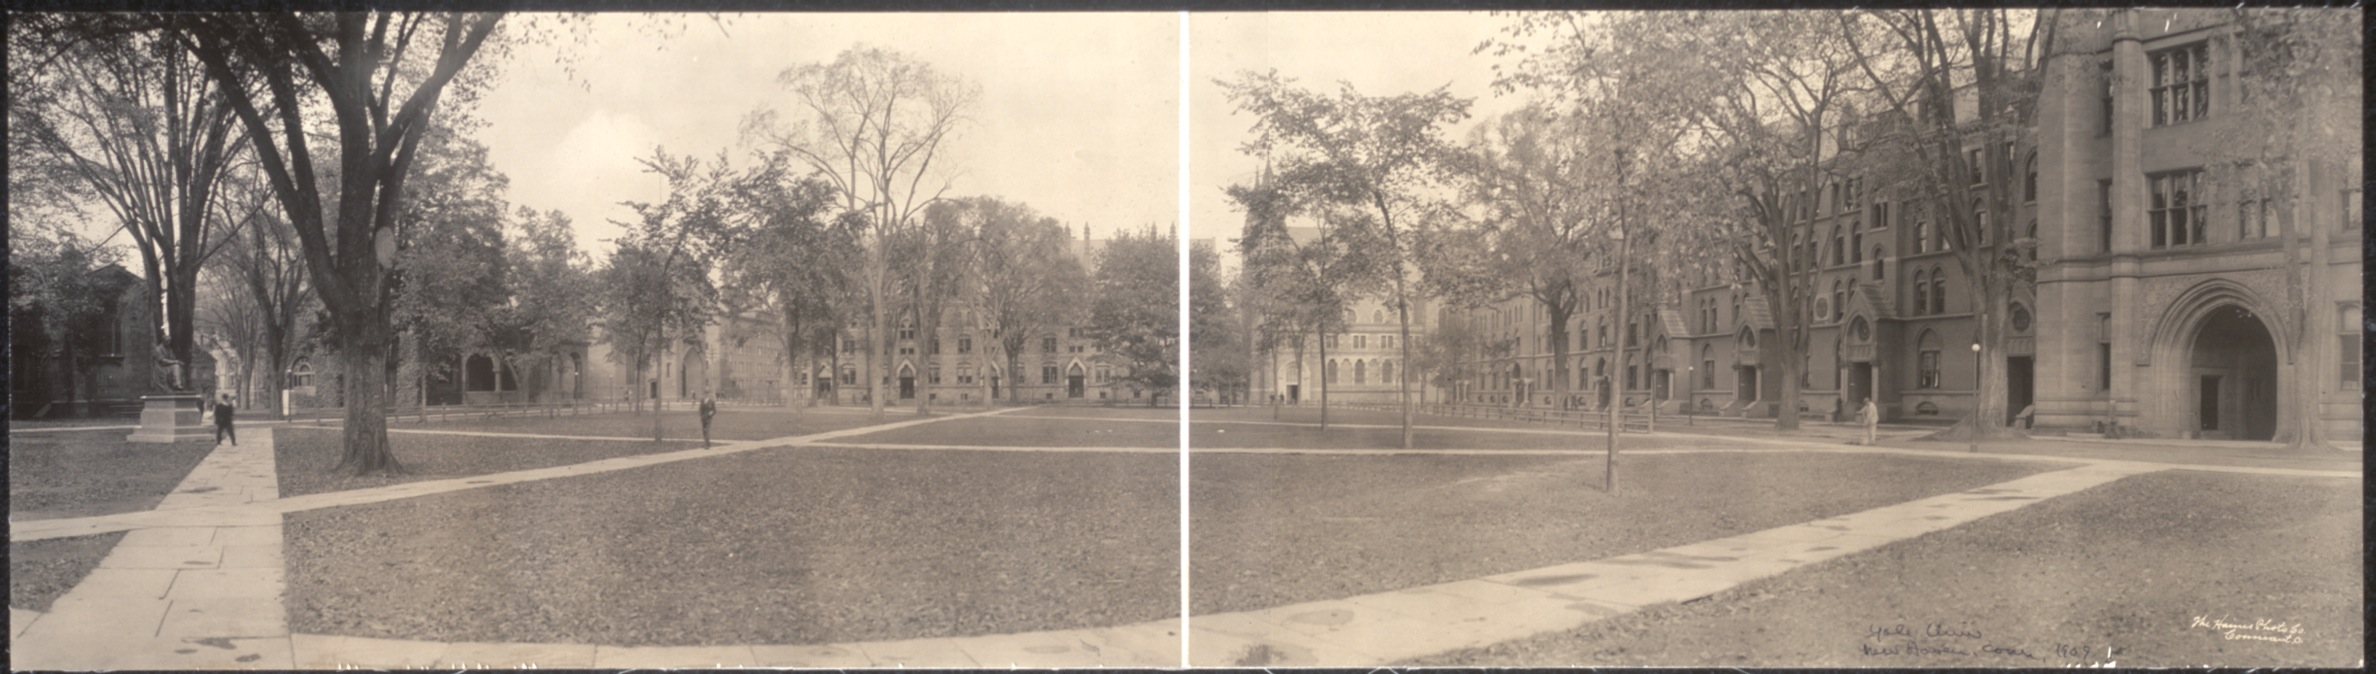 Yale University 1 New Haven Conn©Haines Photo Co. via Wikimedia Commons